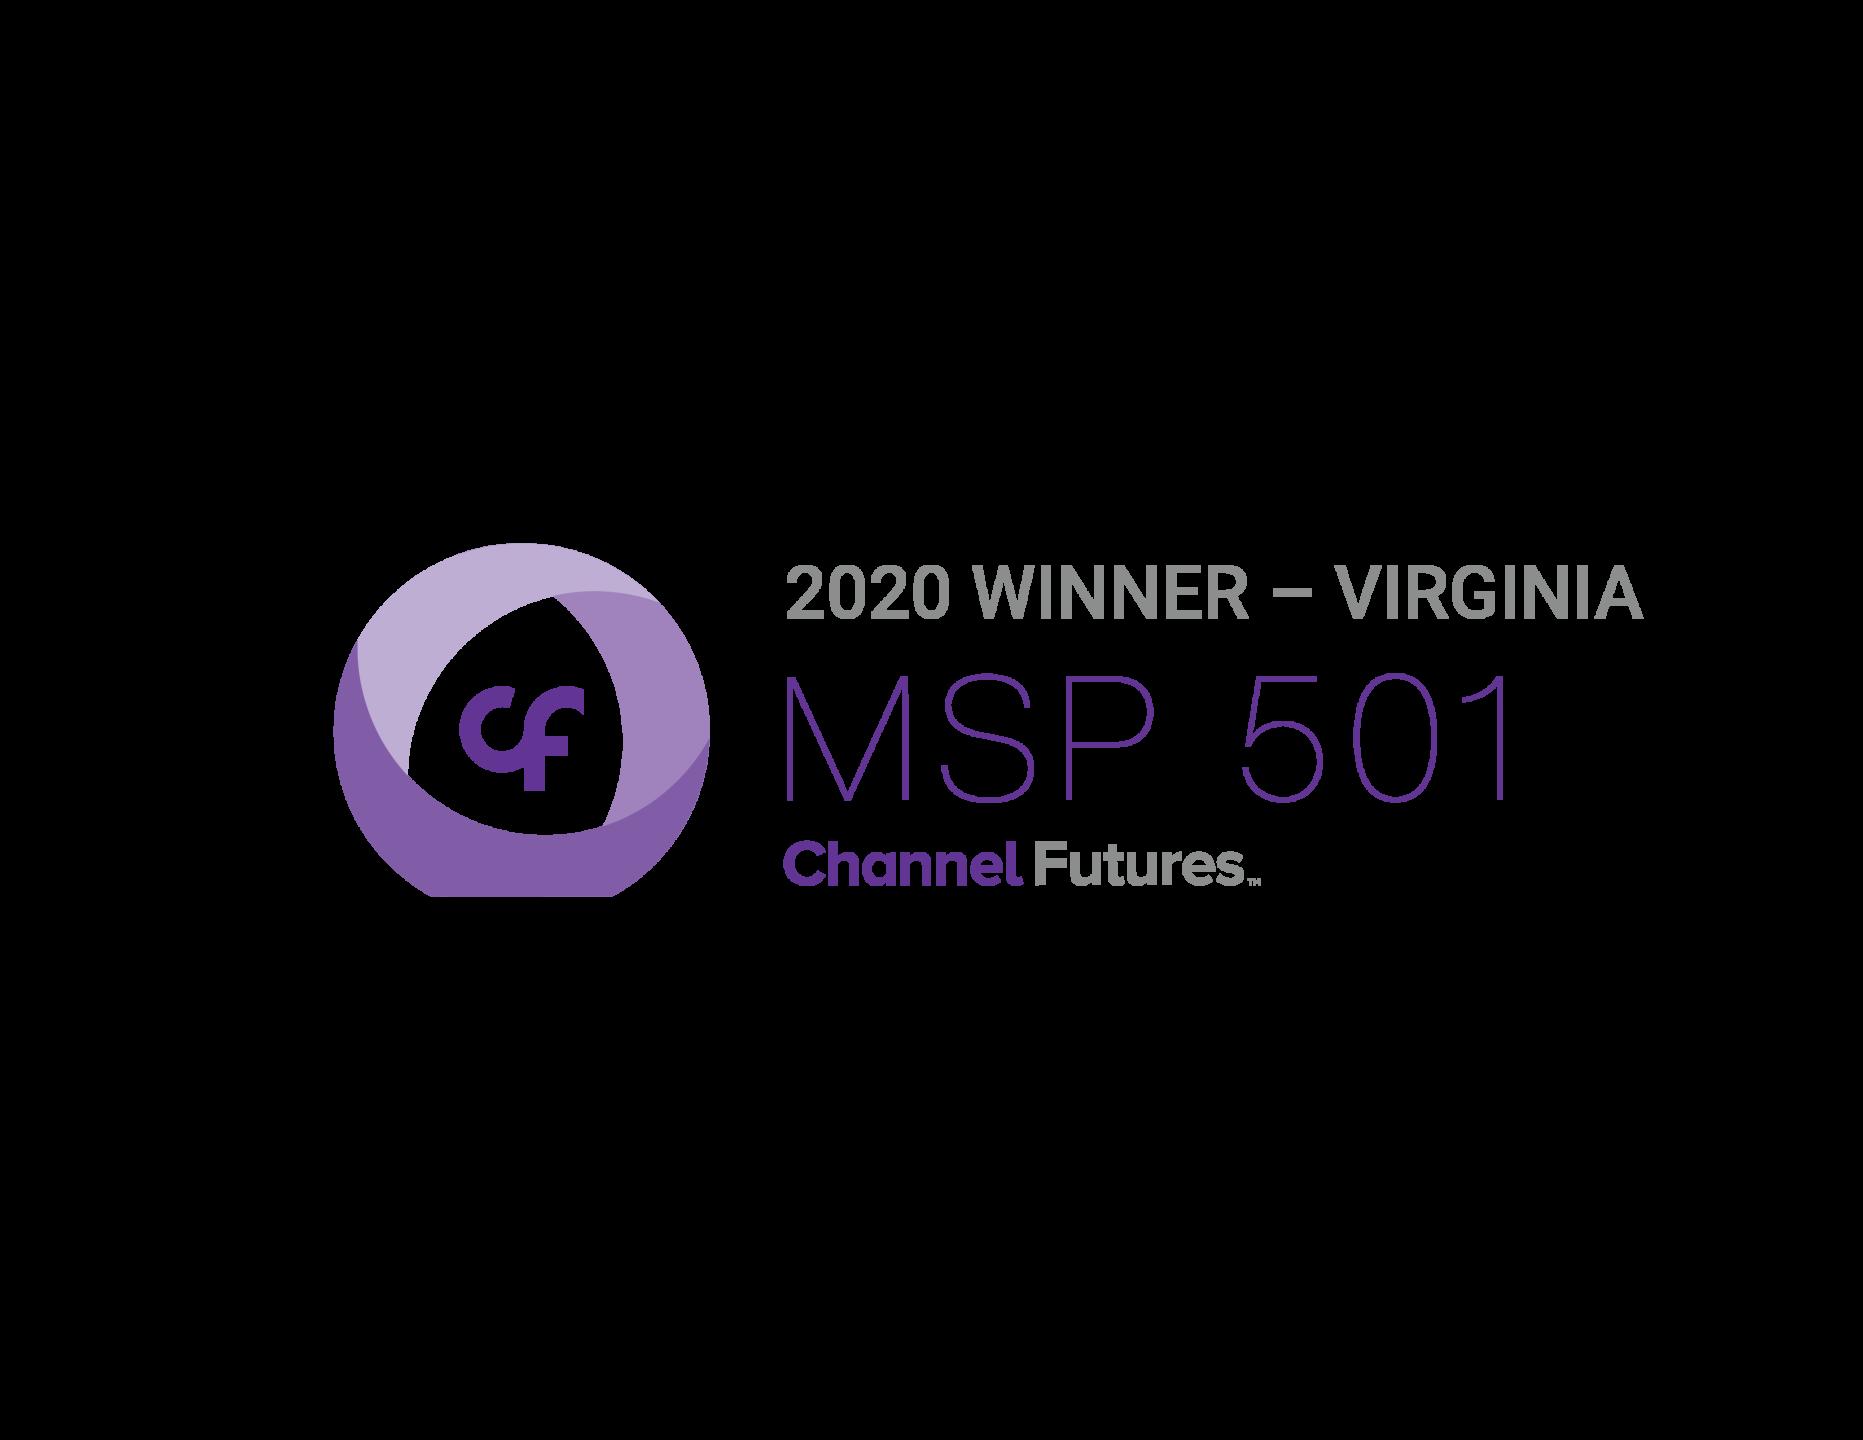 Focus Data Solutions MSP 501 2020 Winner